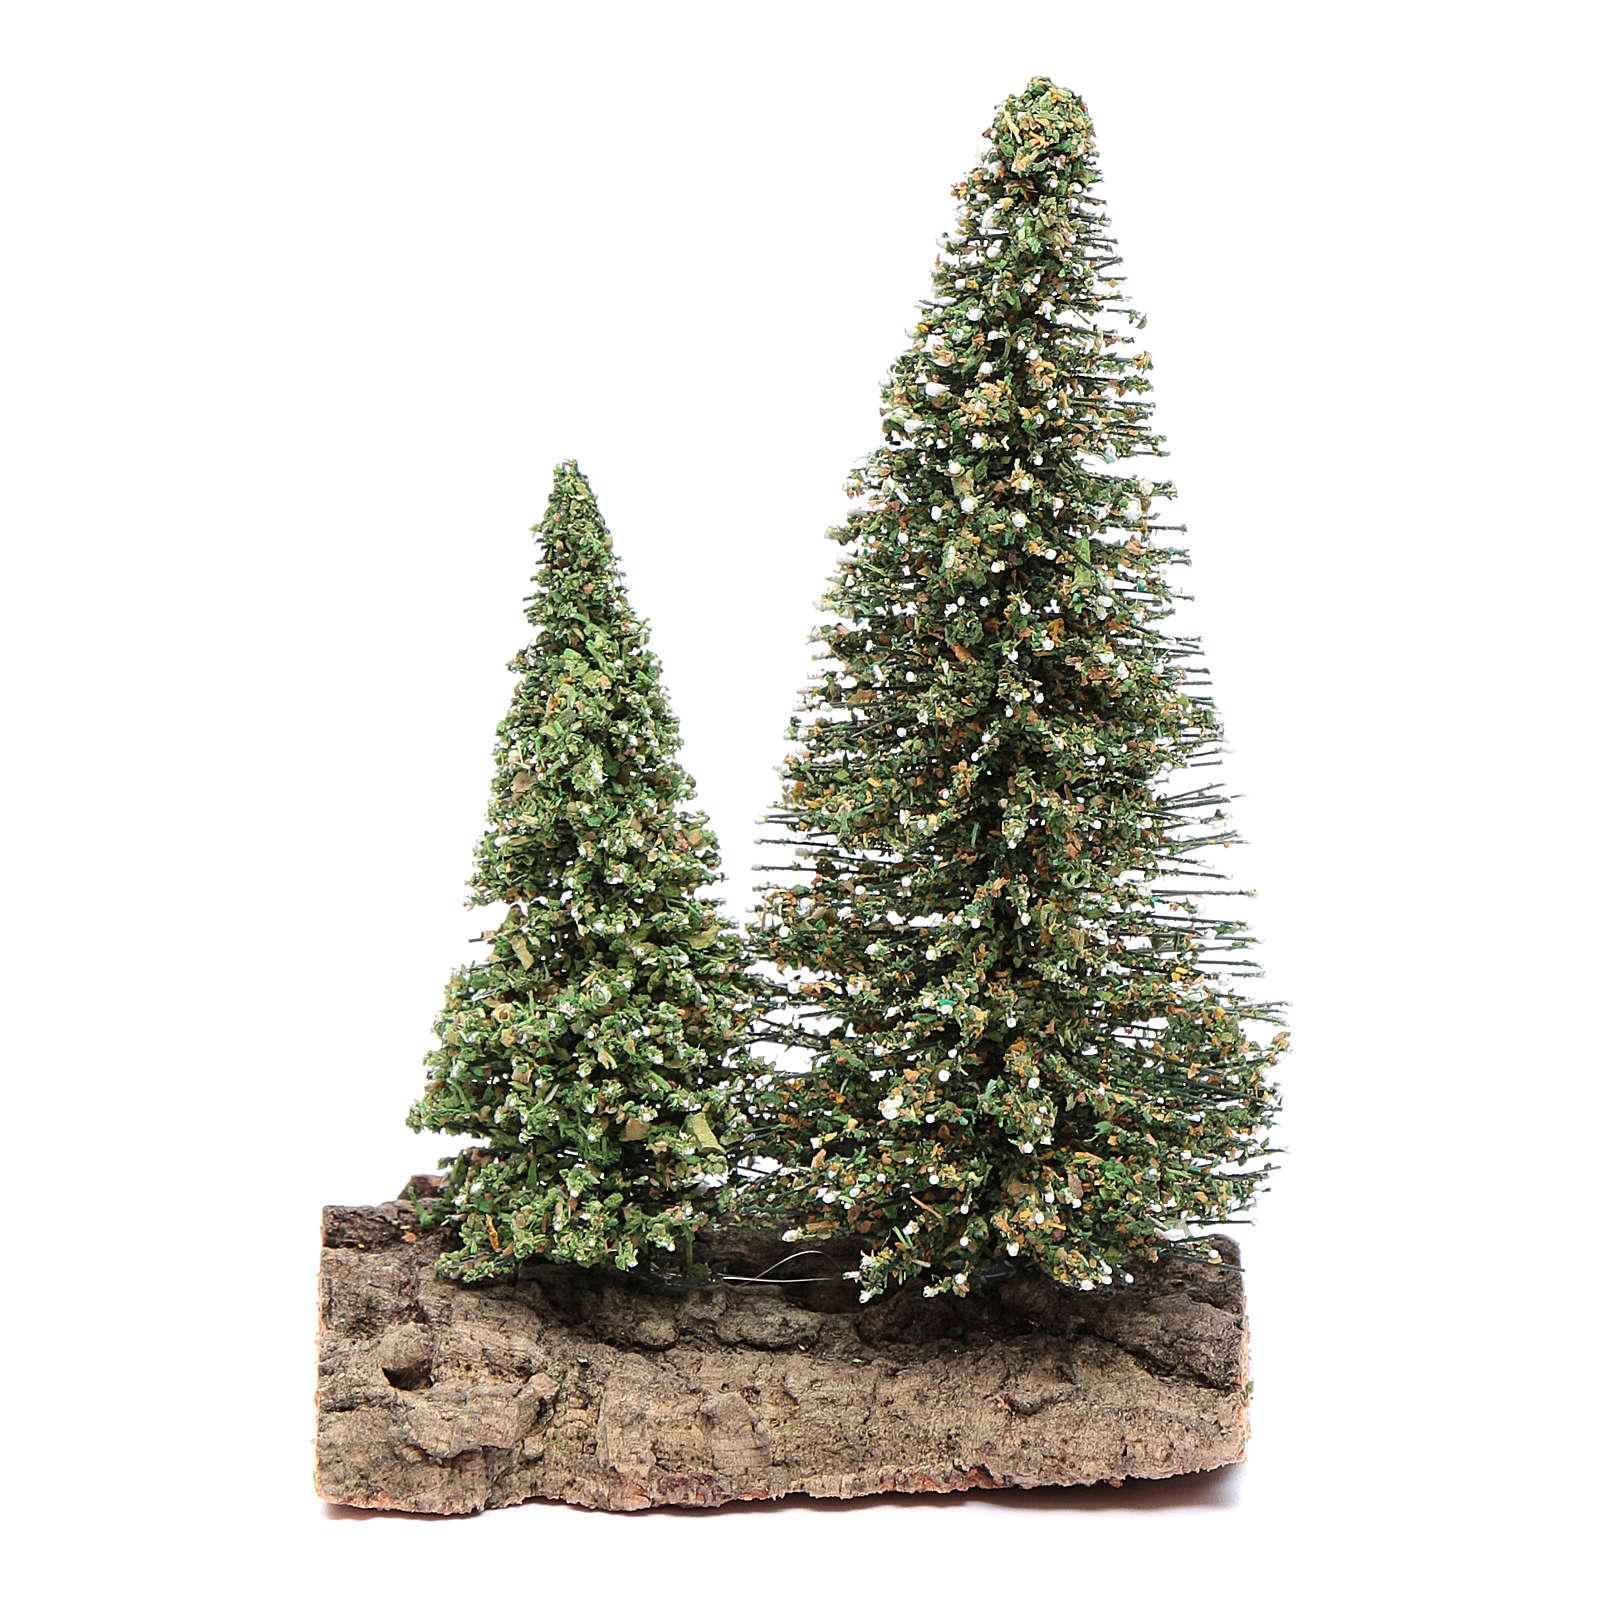 Nativity scene setting two pines on rock 4